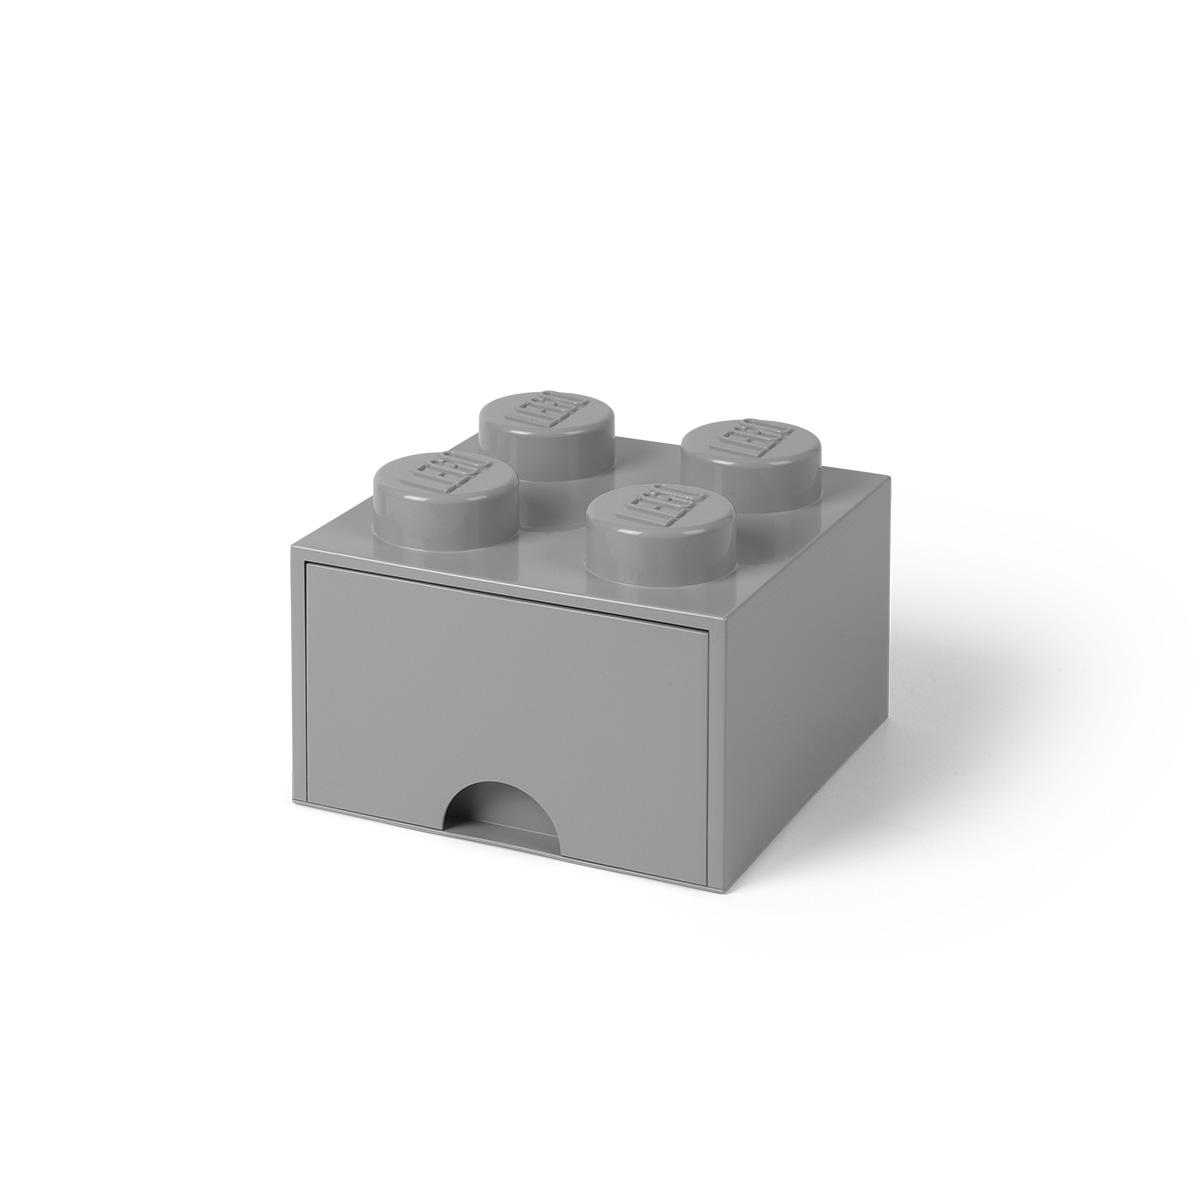 LEGO opbevaringskasse med 1 skuffe - Grå